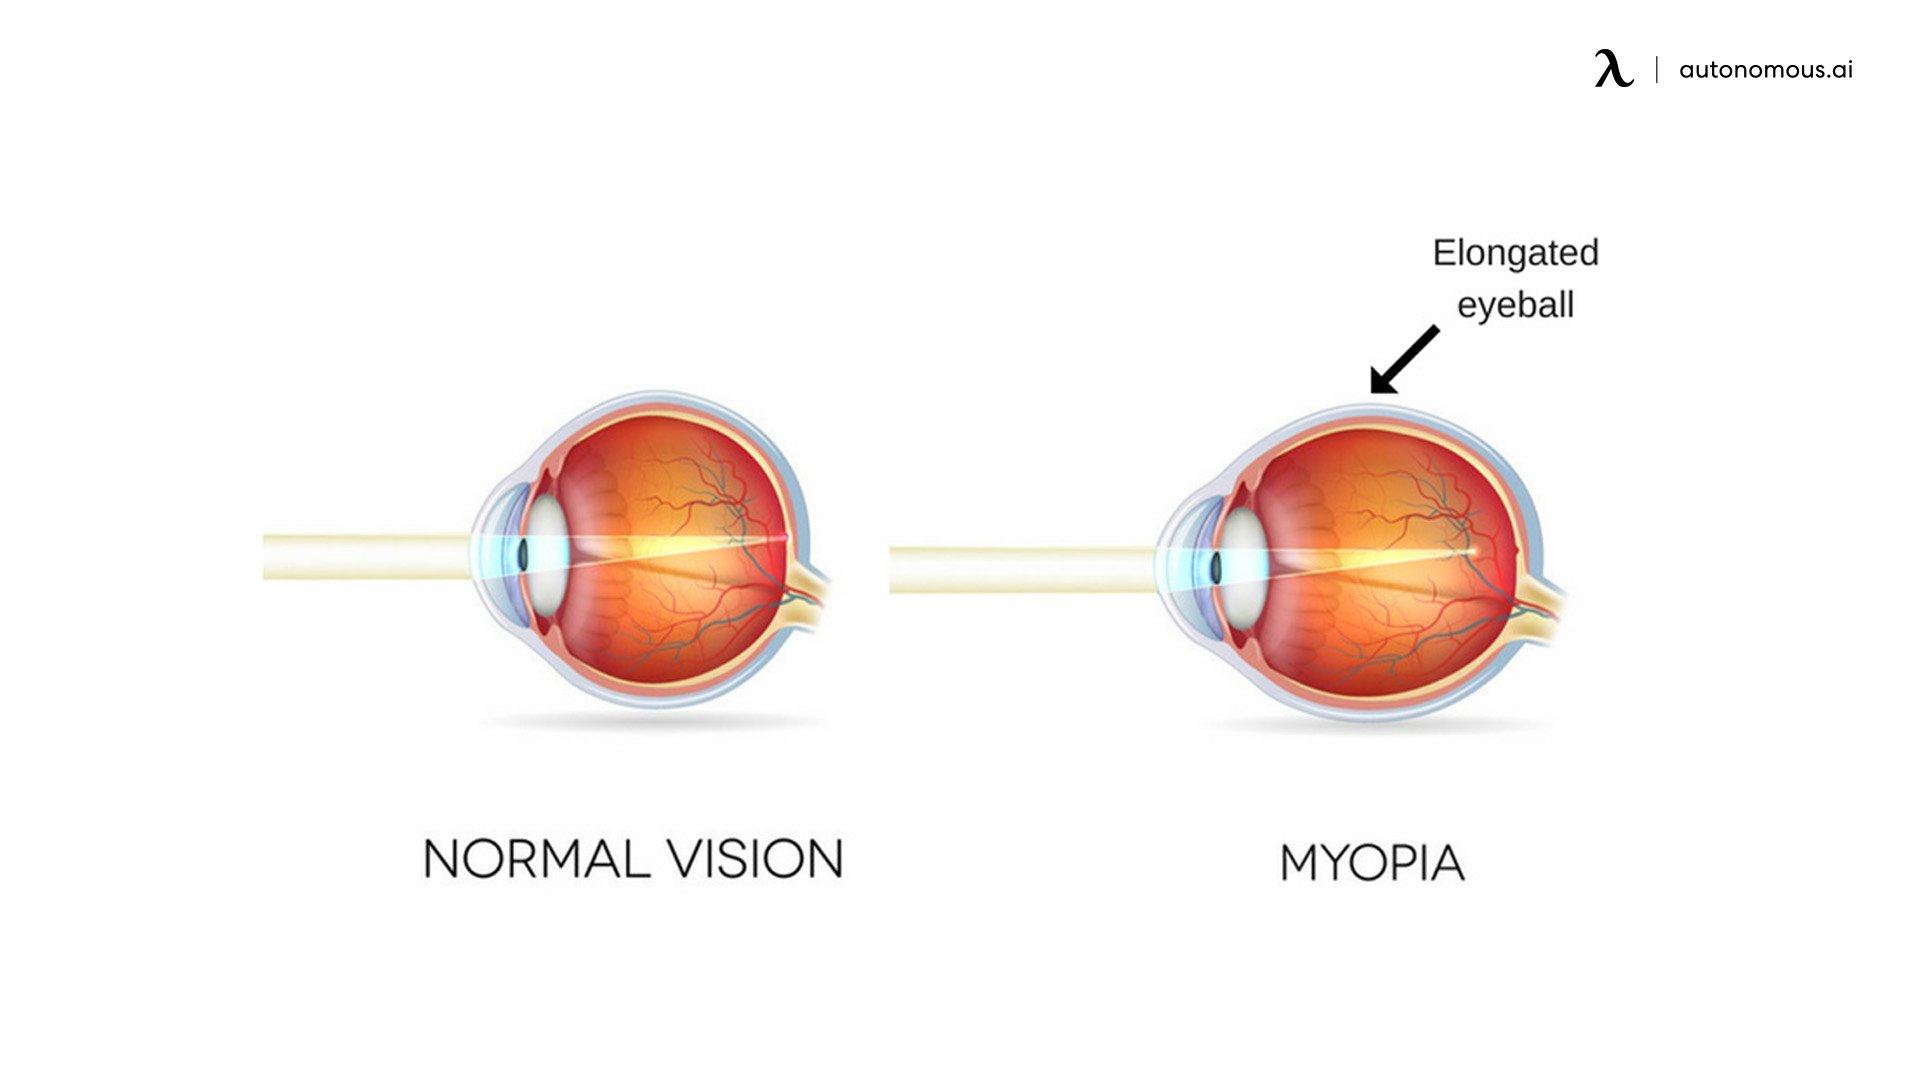 what is Myopia